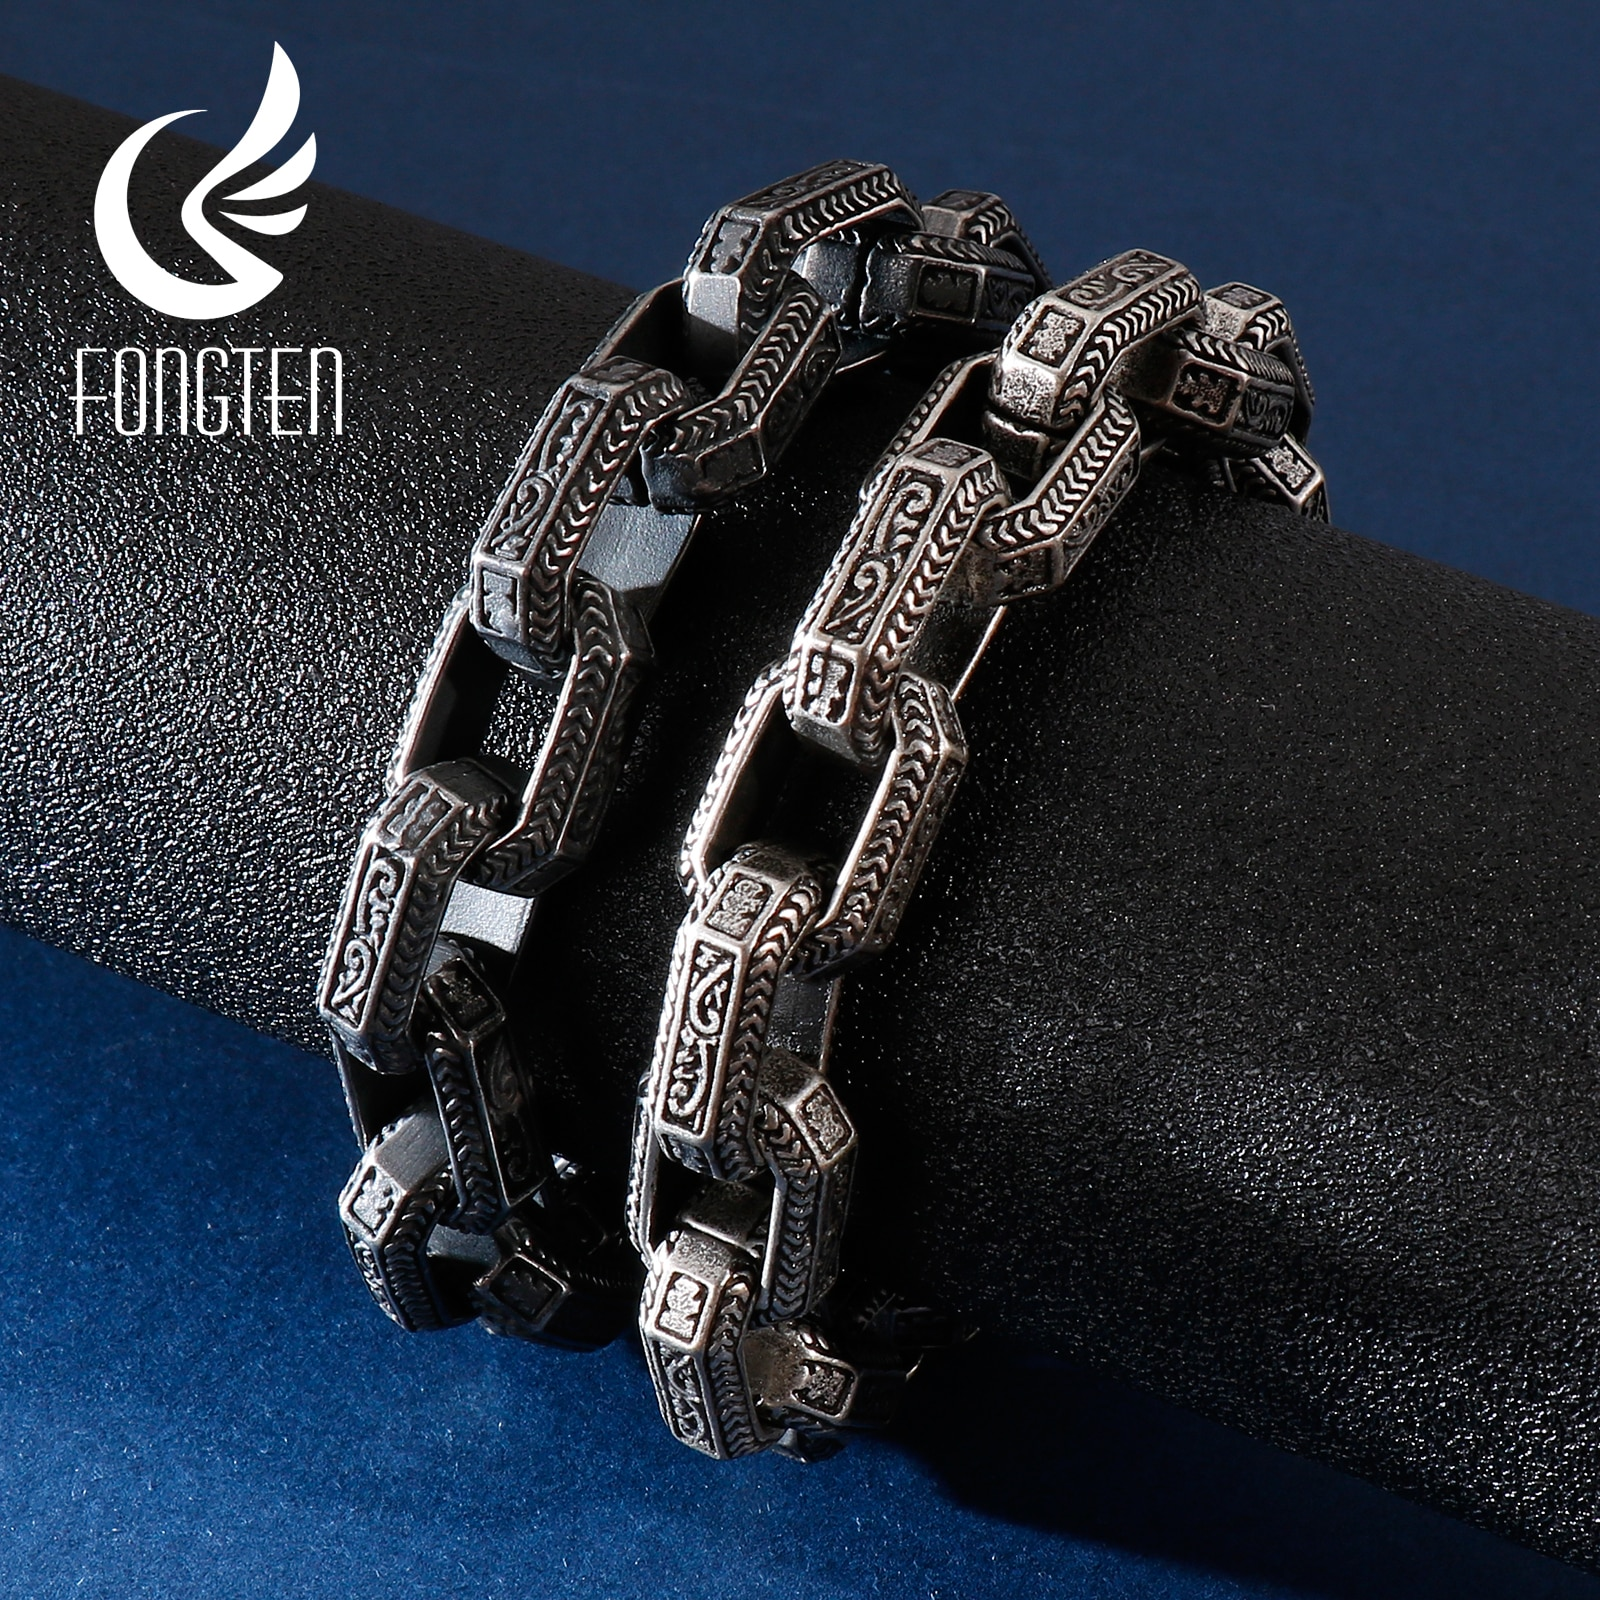 Fongten Vintage Square Bead Bracelet Men Black Stainless Steel Viking Punk Charms Heavy Bracelets Fashion Jewelry